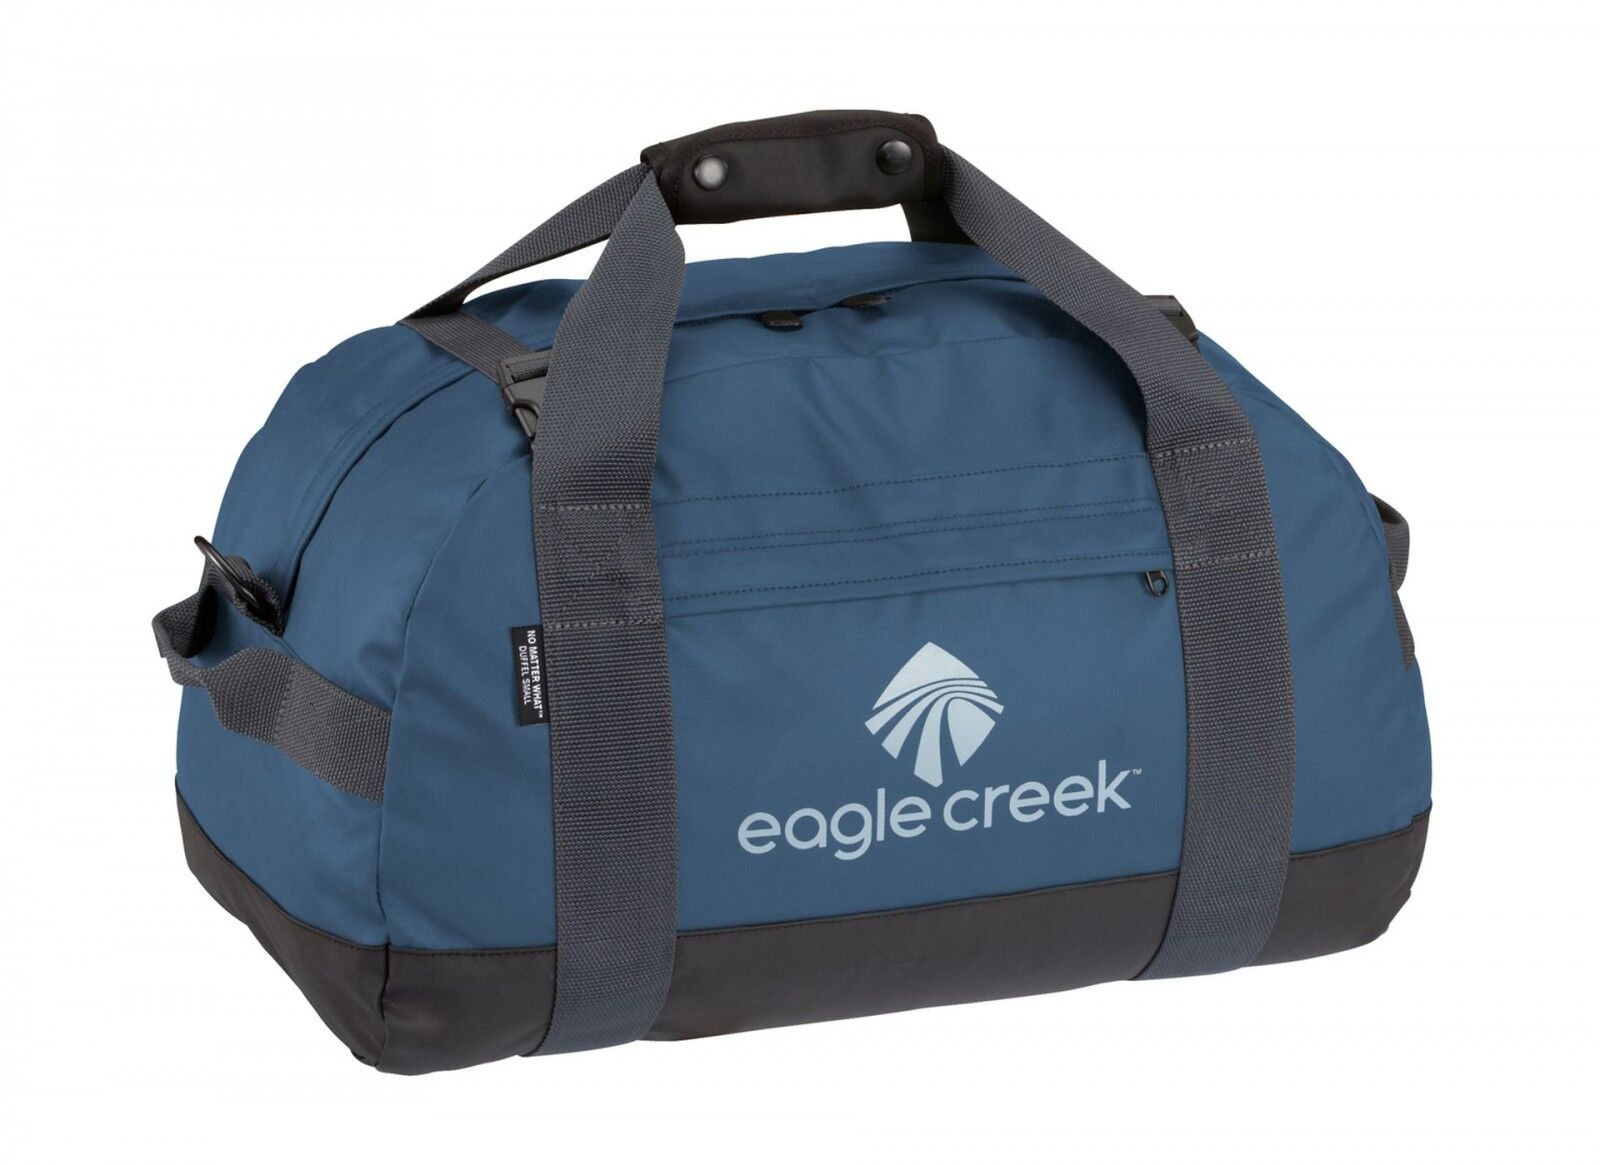 Eagle creek Bolsa De  Viaje No Matter What Duffel S Slate blueee  high quality & fast shipping